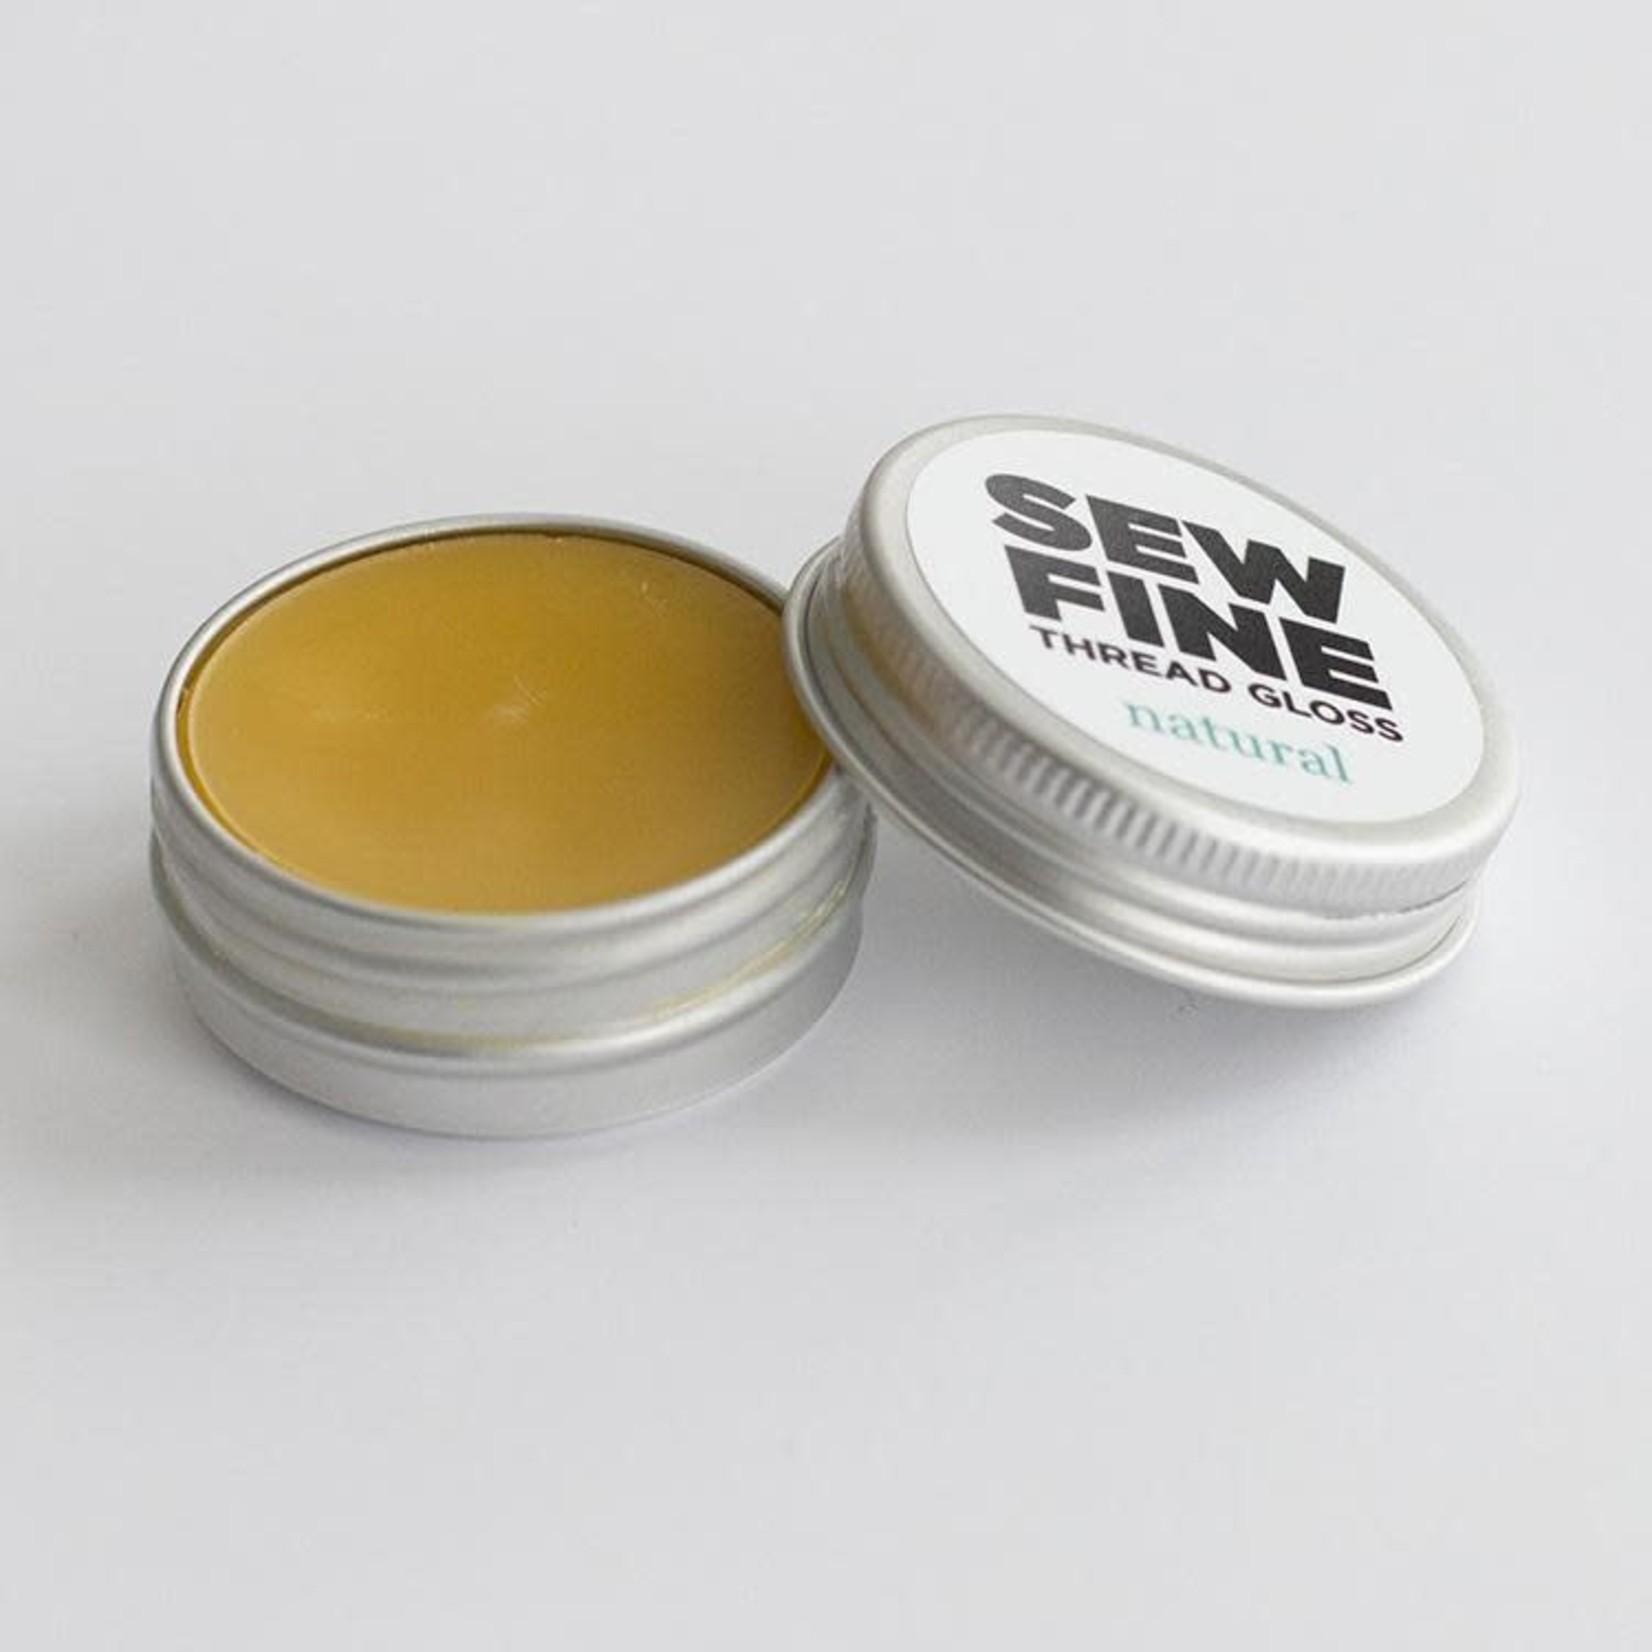 Sew Fine Sew Fine Thread Gloss: Natural 0.5 oz